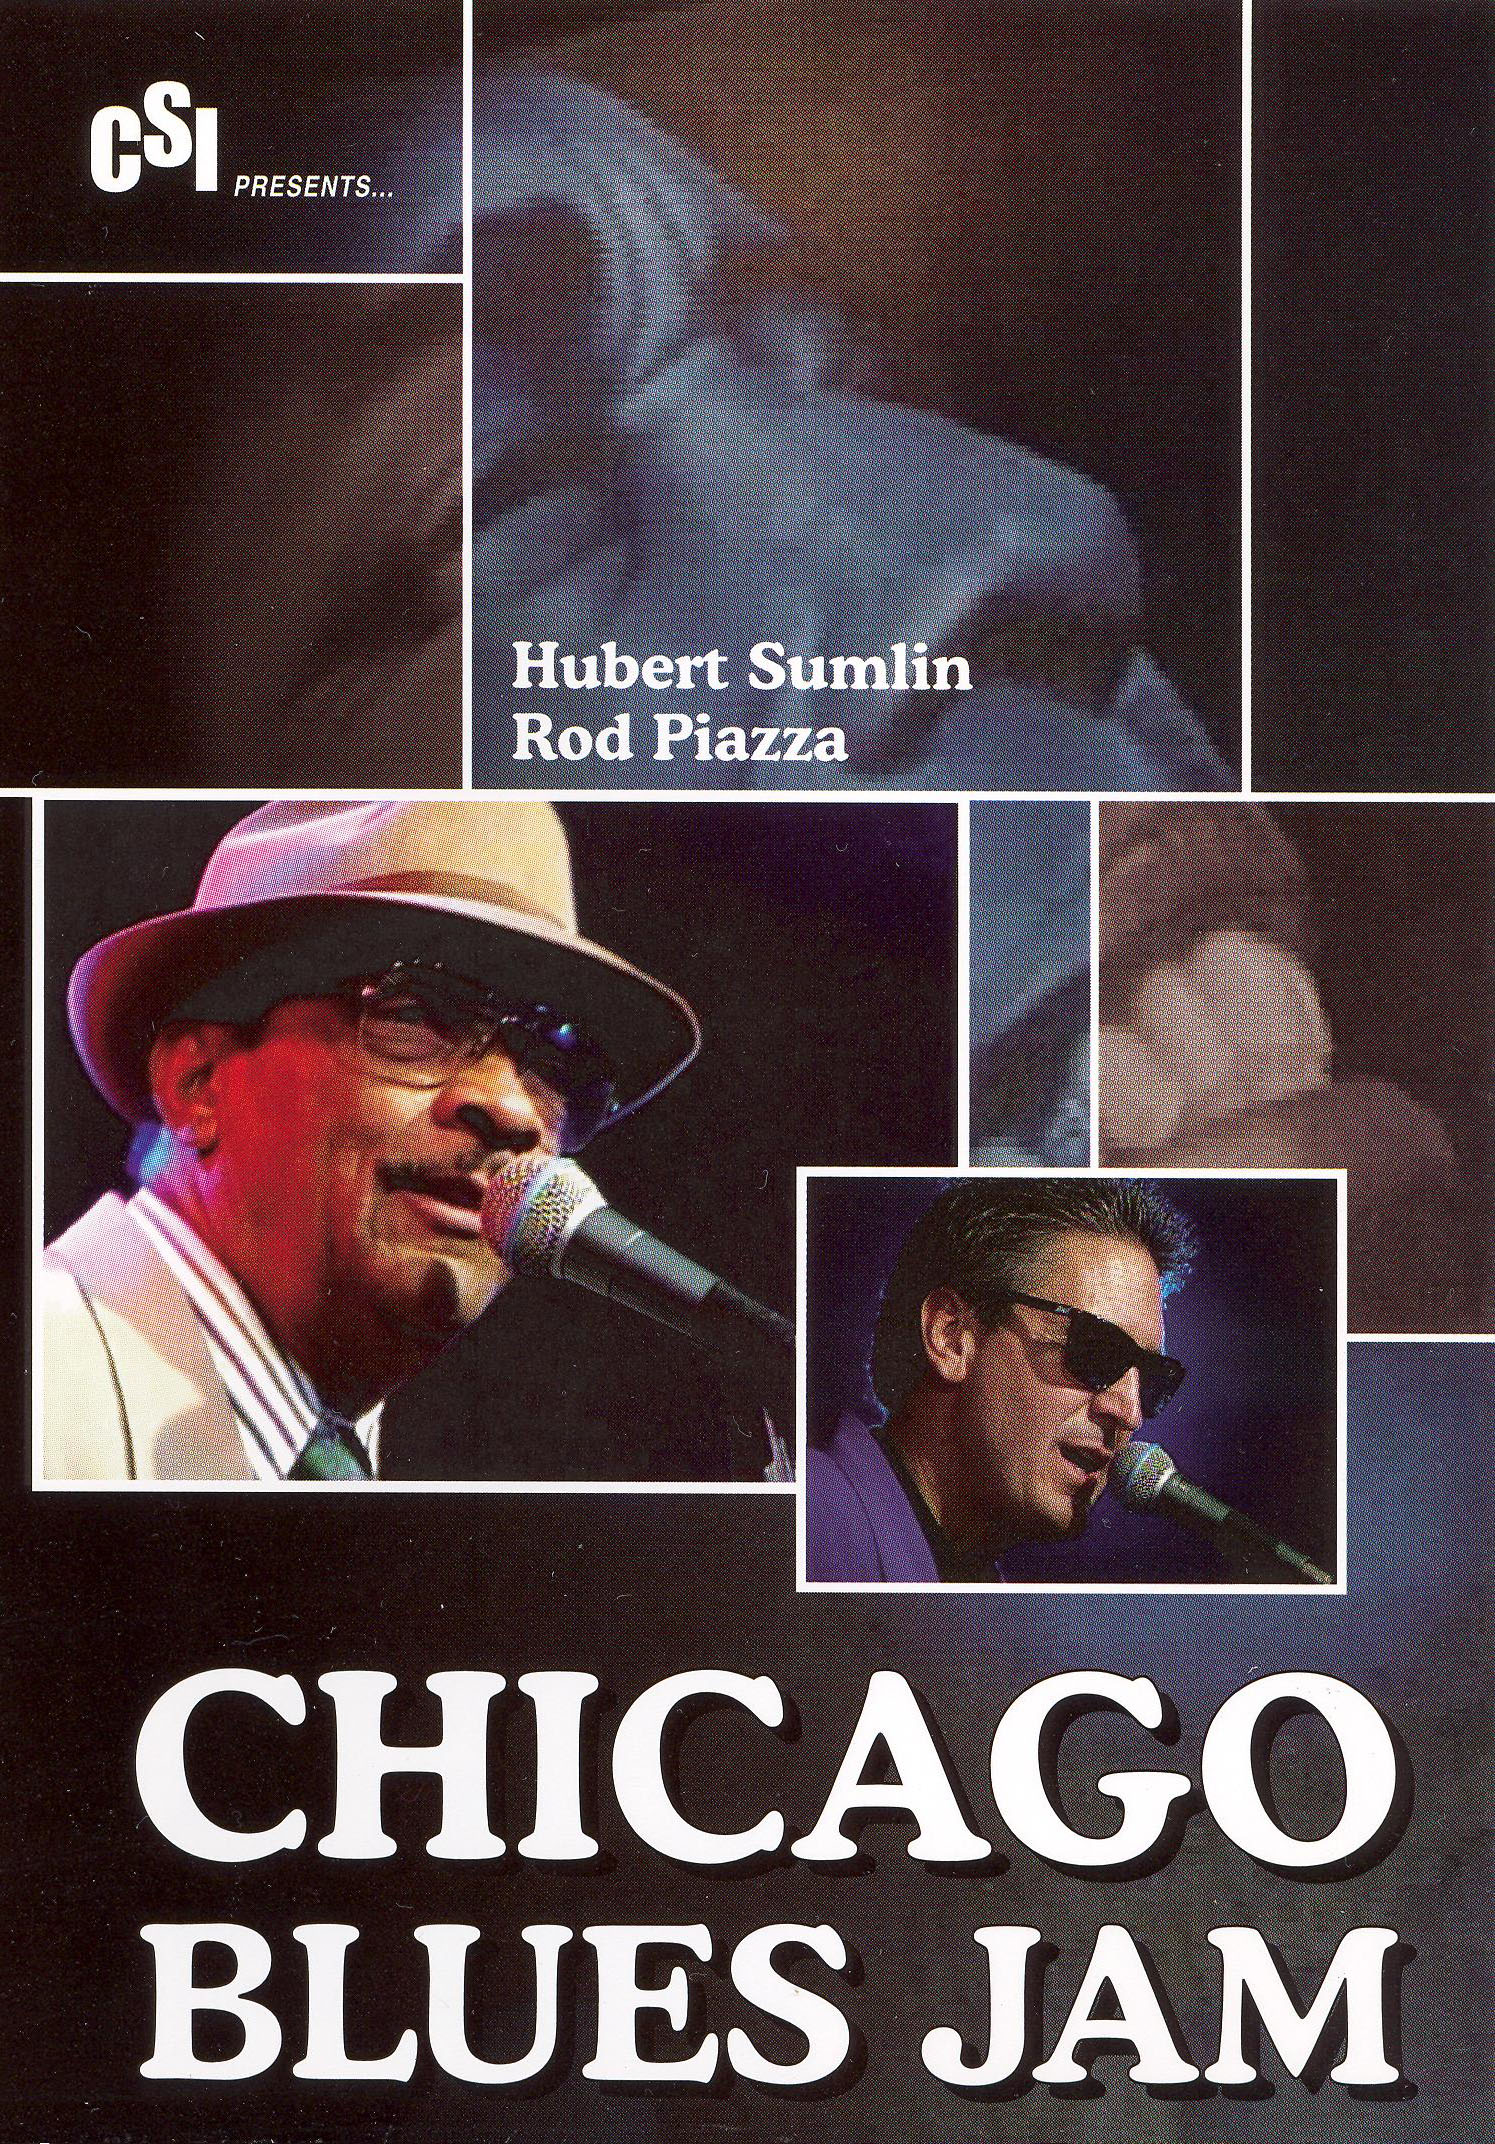 Chicago Blues Jam: Hubert Sumlin/Rod Piazza